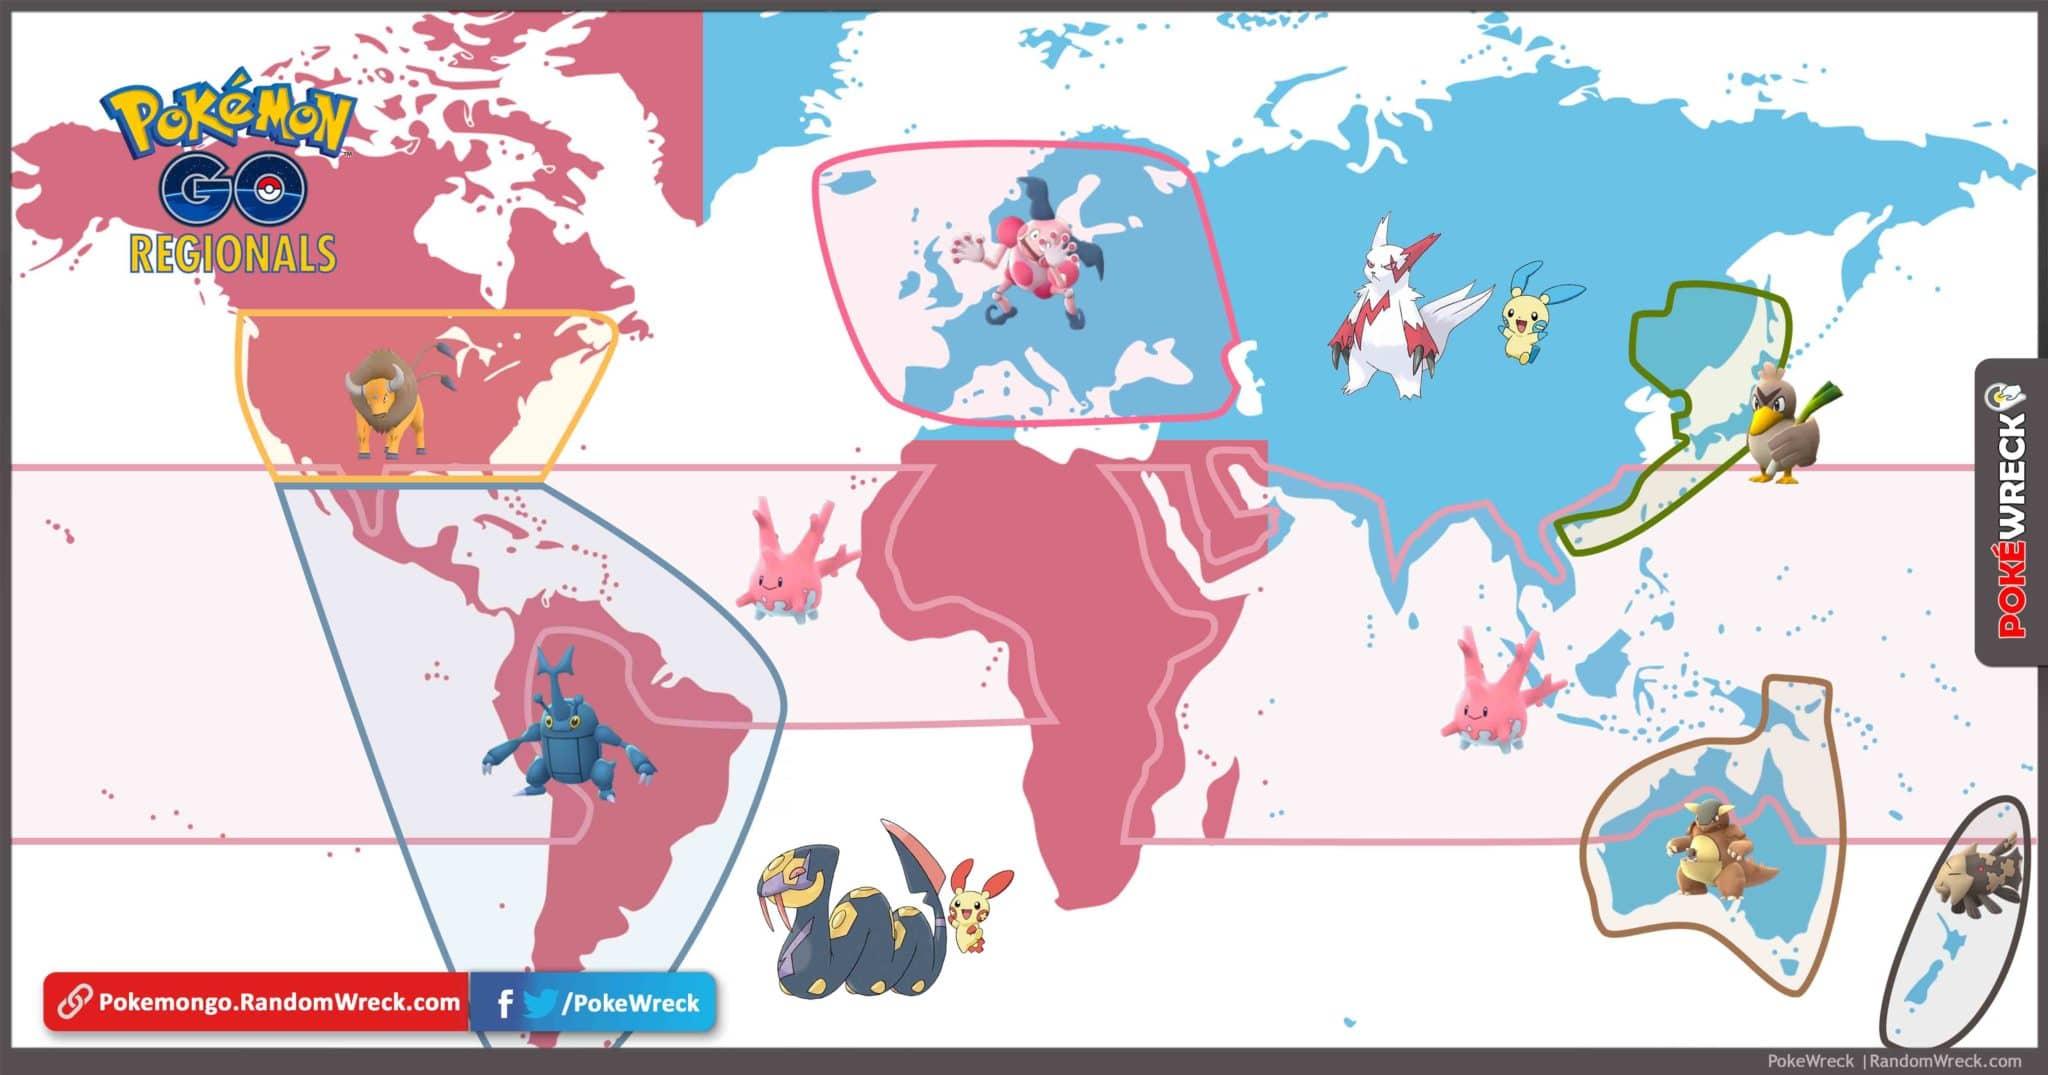 Pokemon Go Regional Map